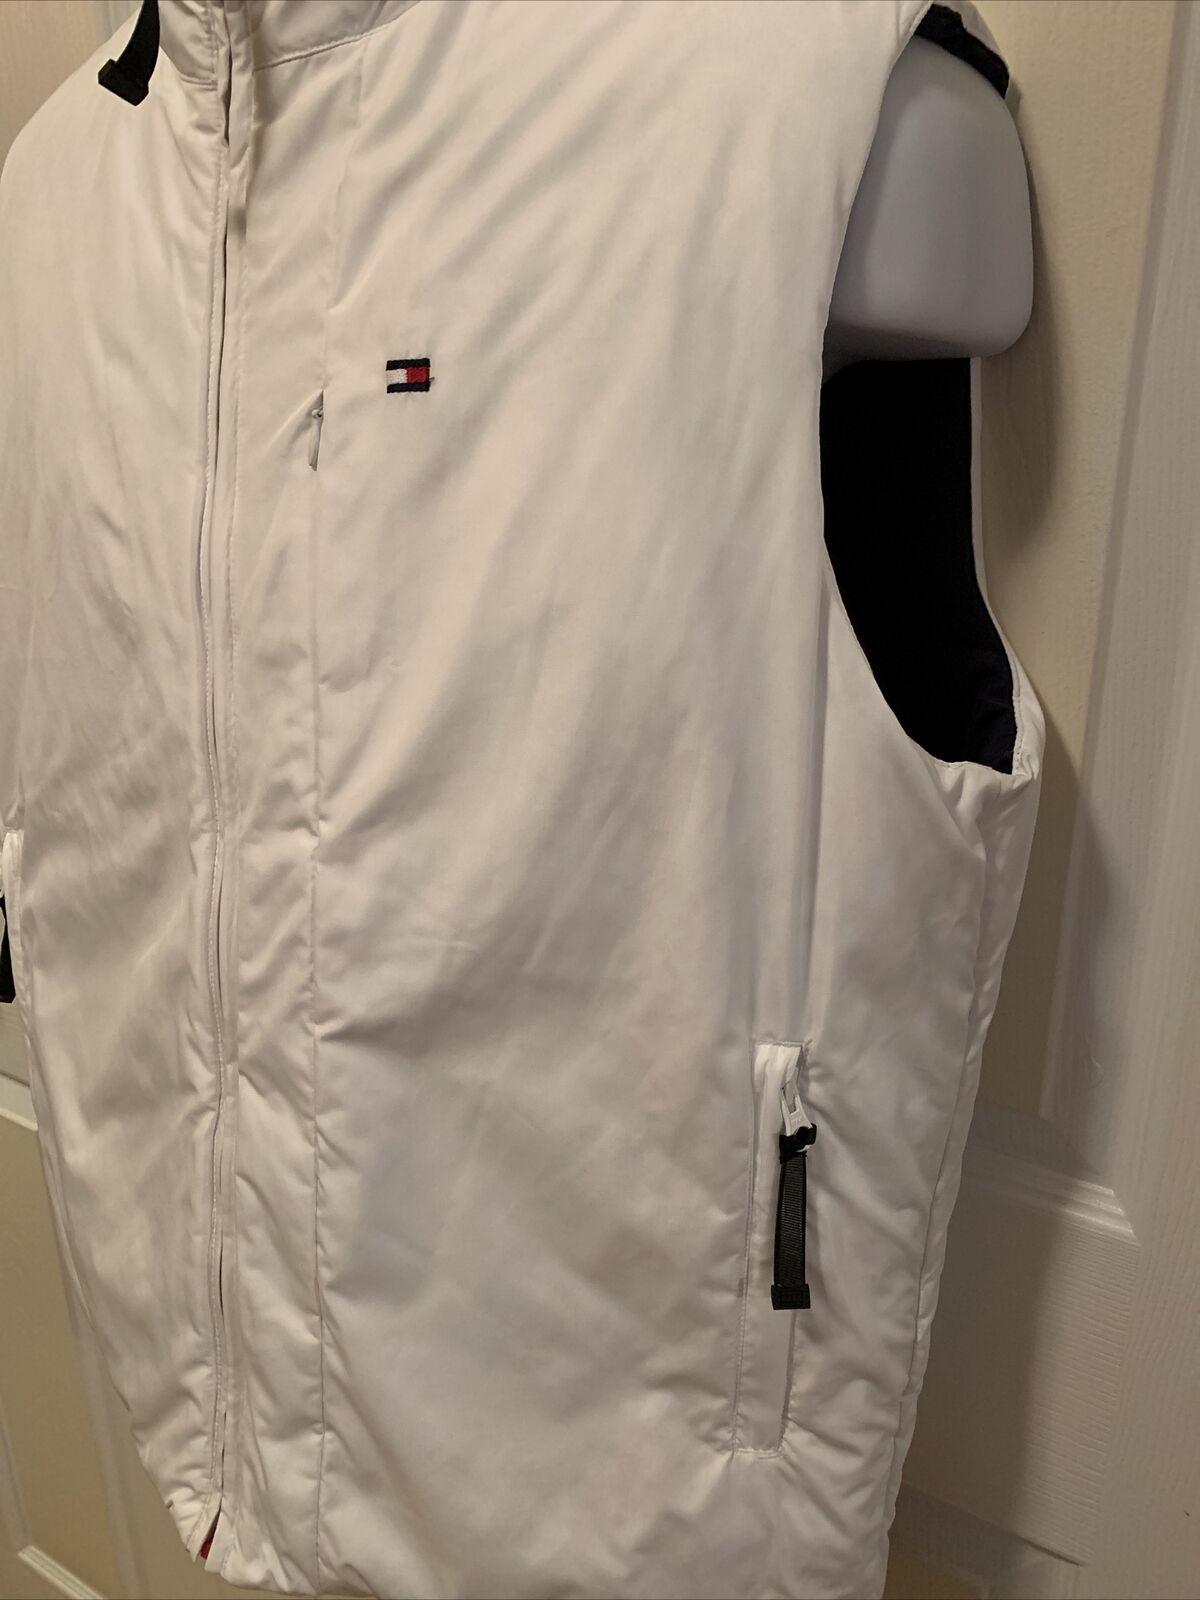 Tommy Hilfiger Mens Reversible Puffy Vest Blue/Wh… - image 10